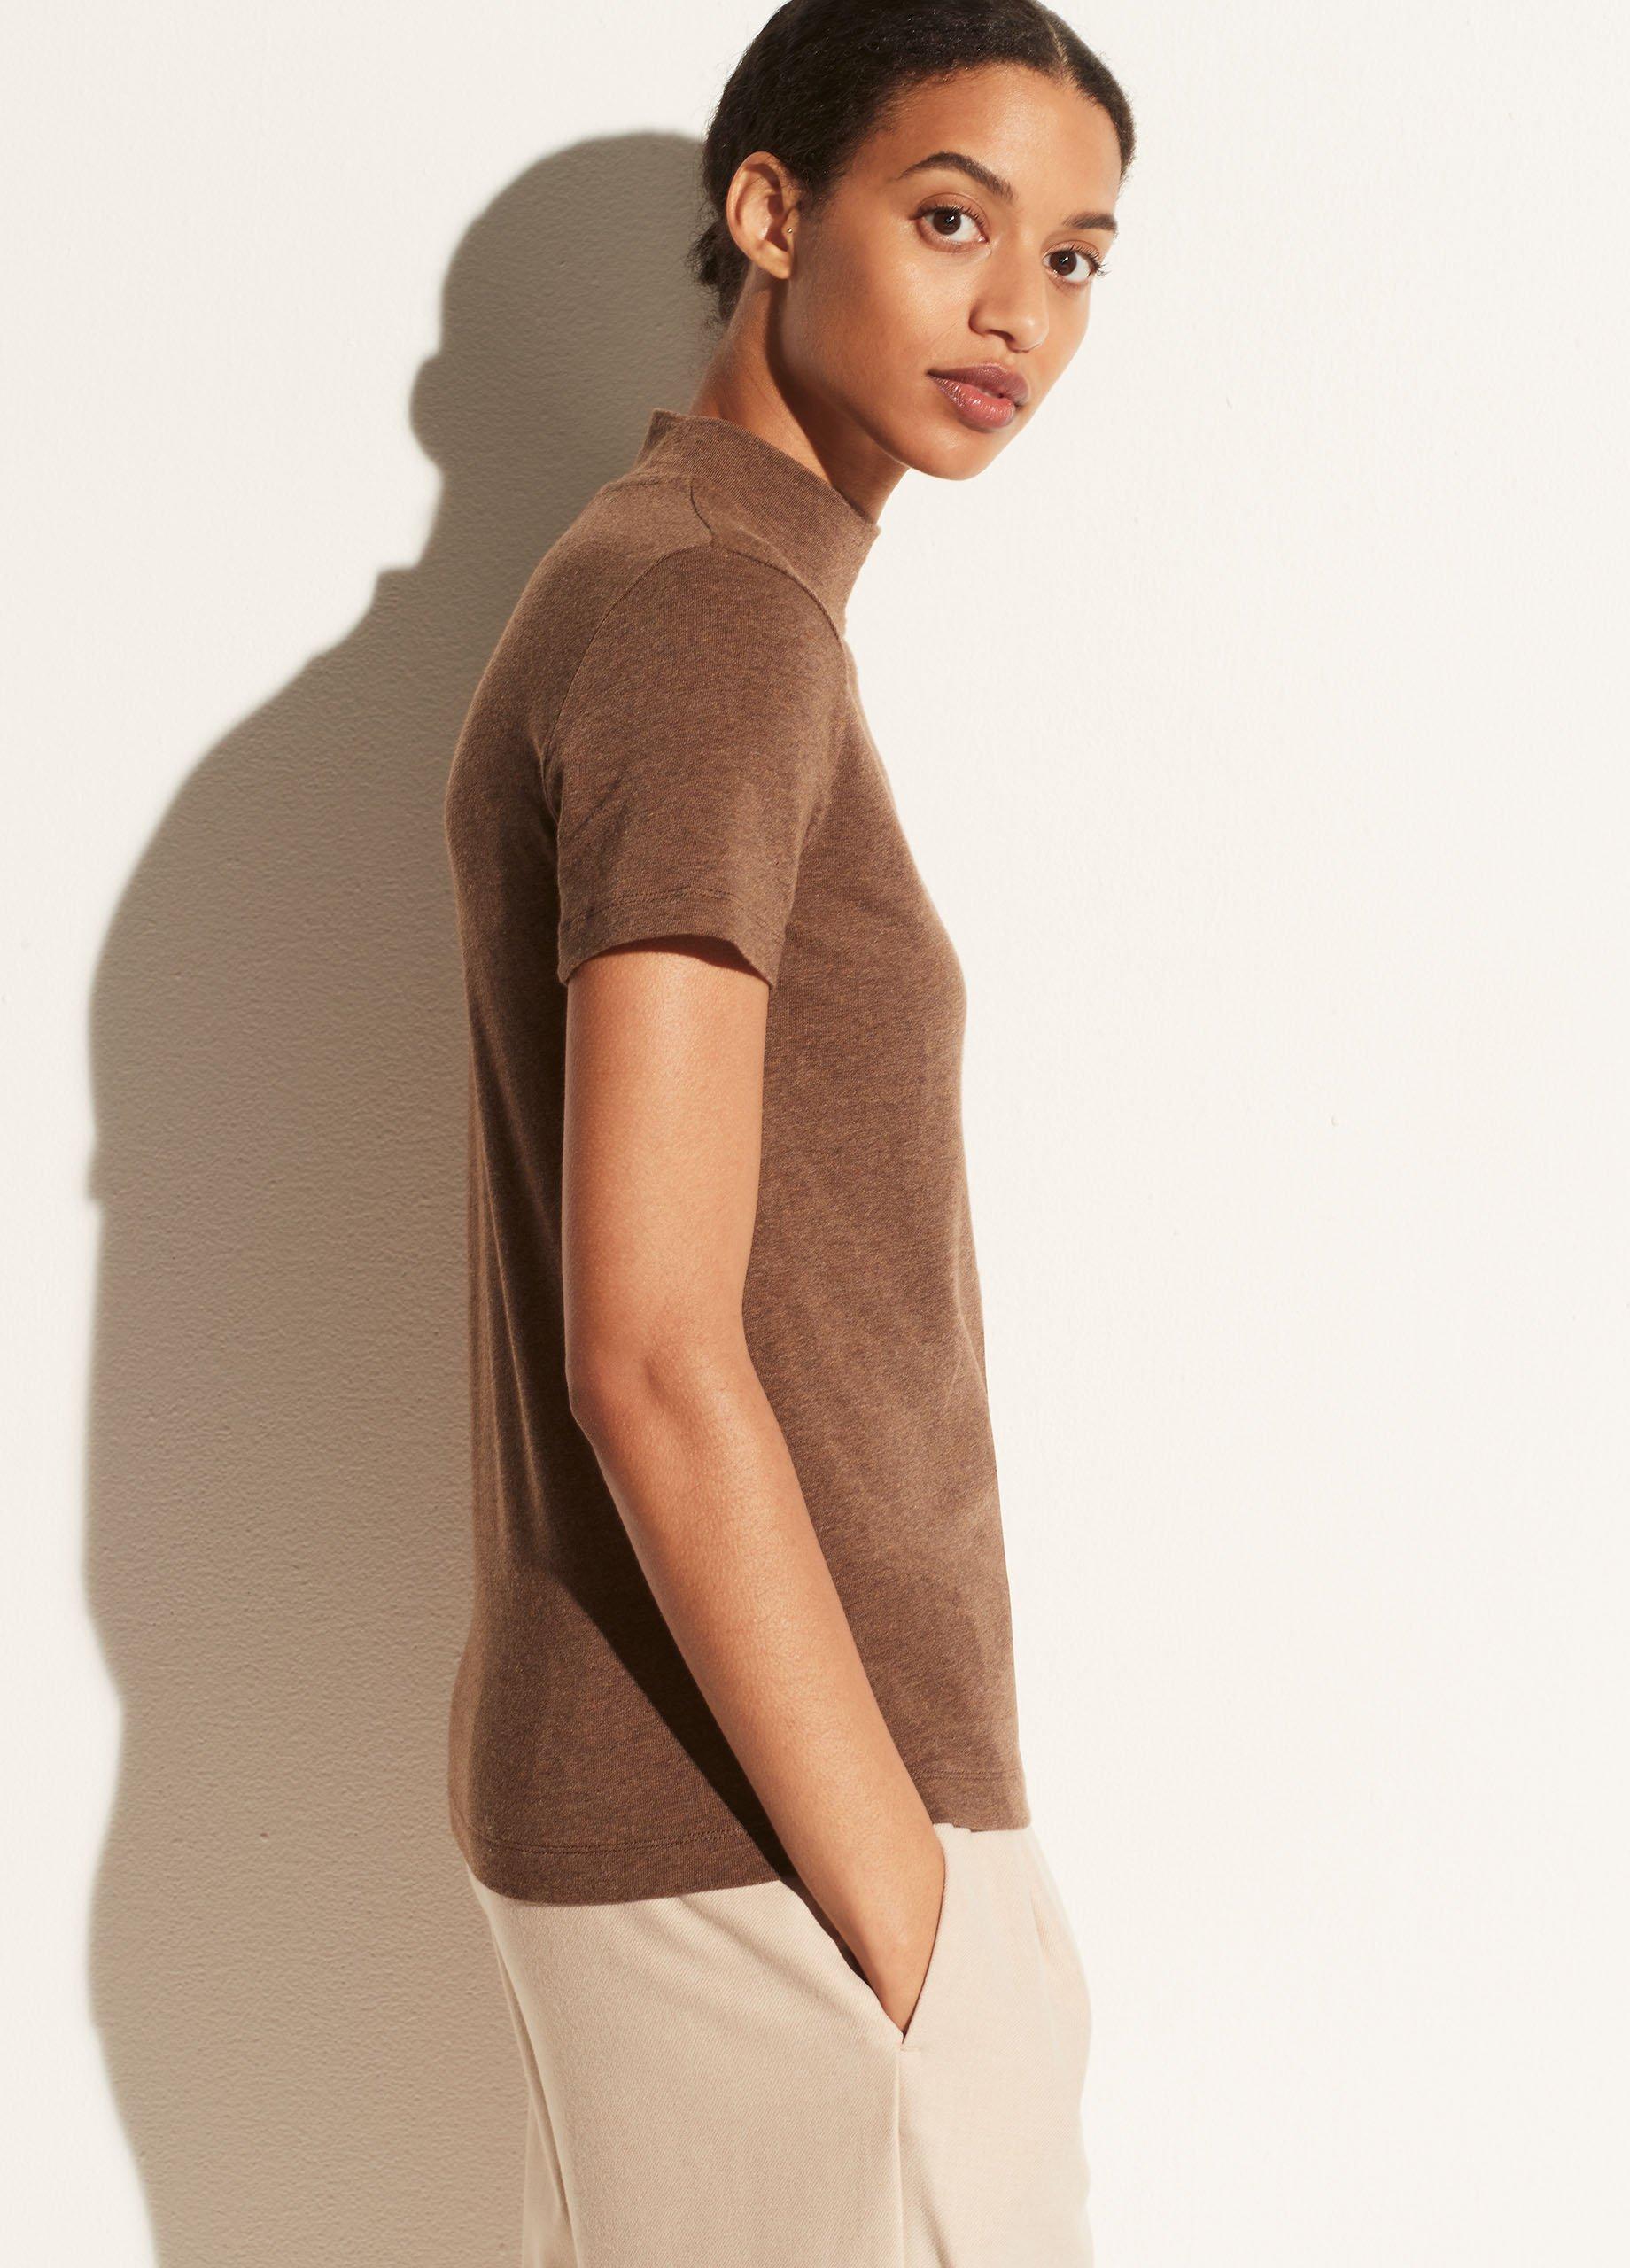 Short Sleeve Mock Neck